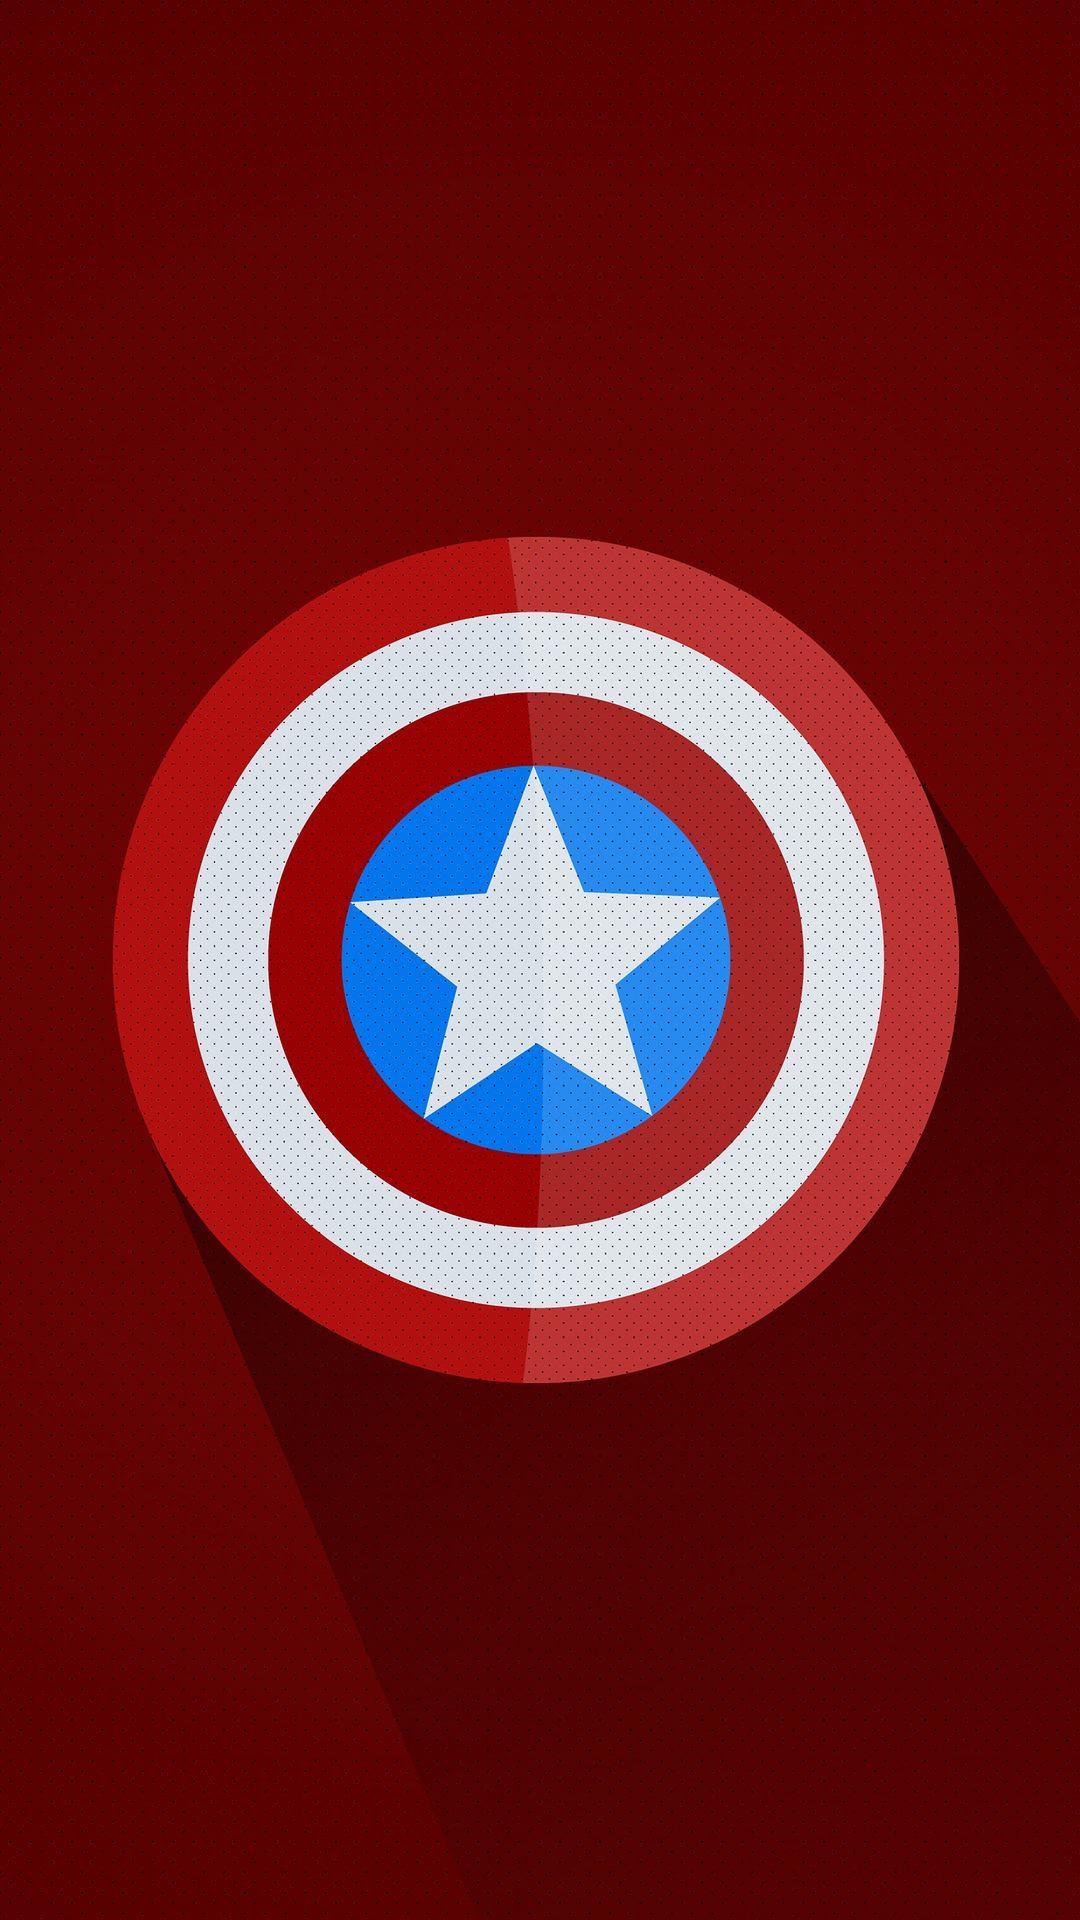 captain america minimal logo 5k 92 1080x1920 - Pack de Fondos de Pantalla Minimalistas (+100 Imagenes)